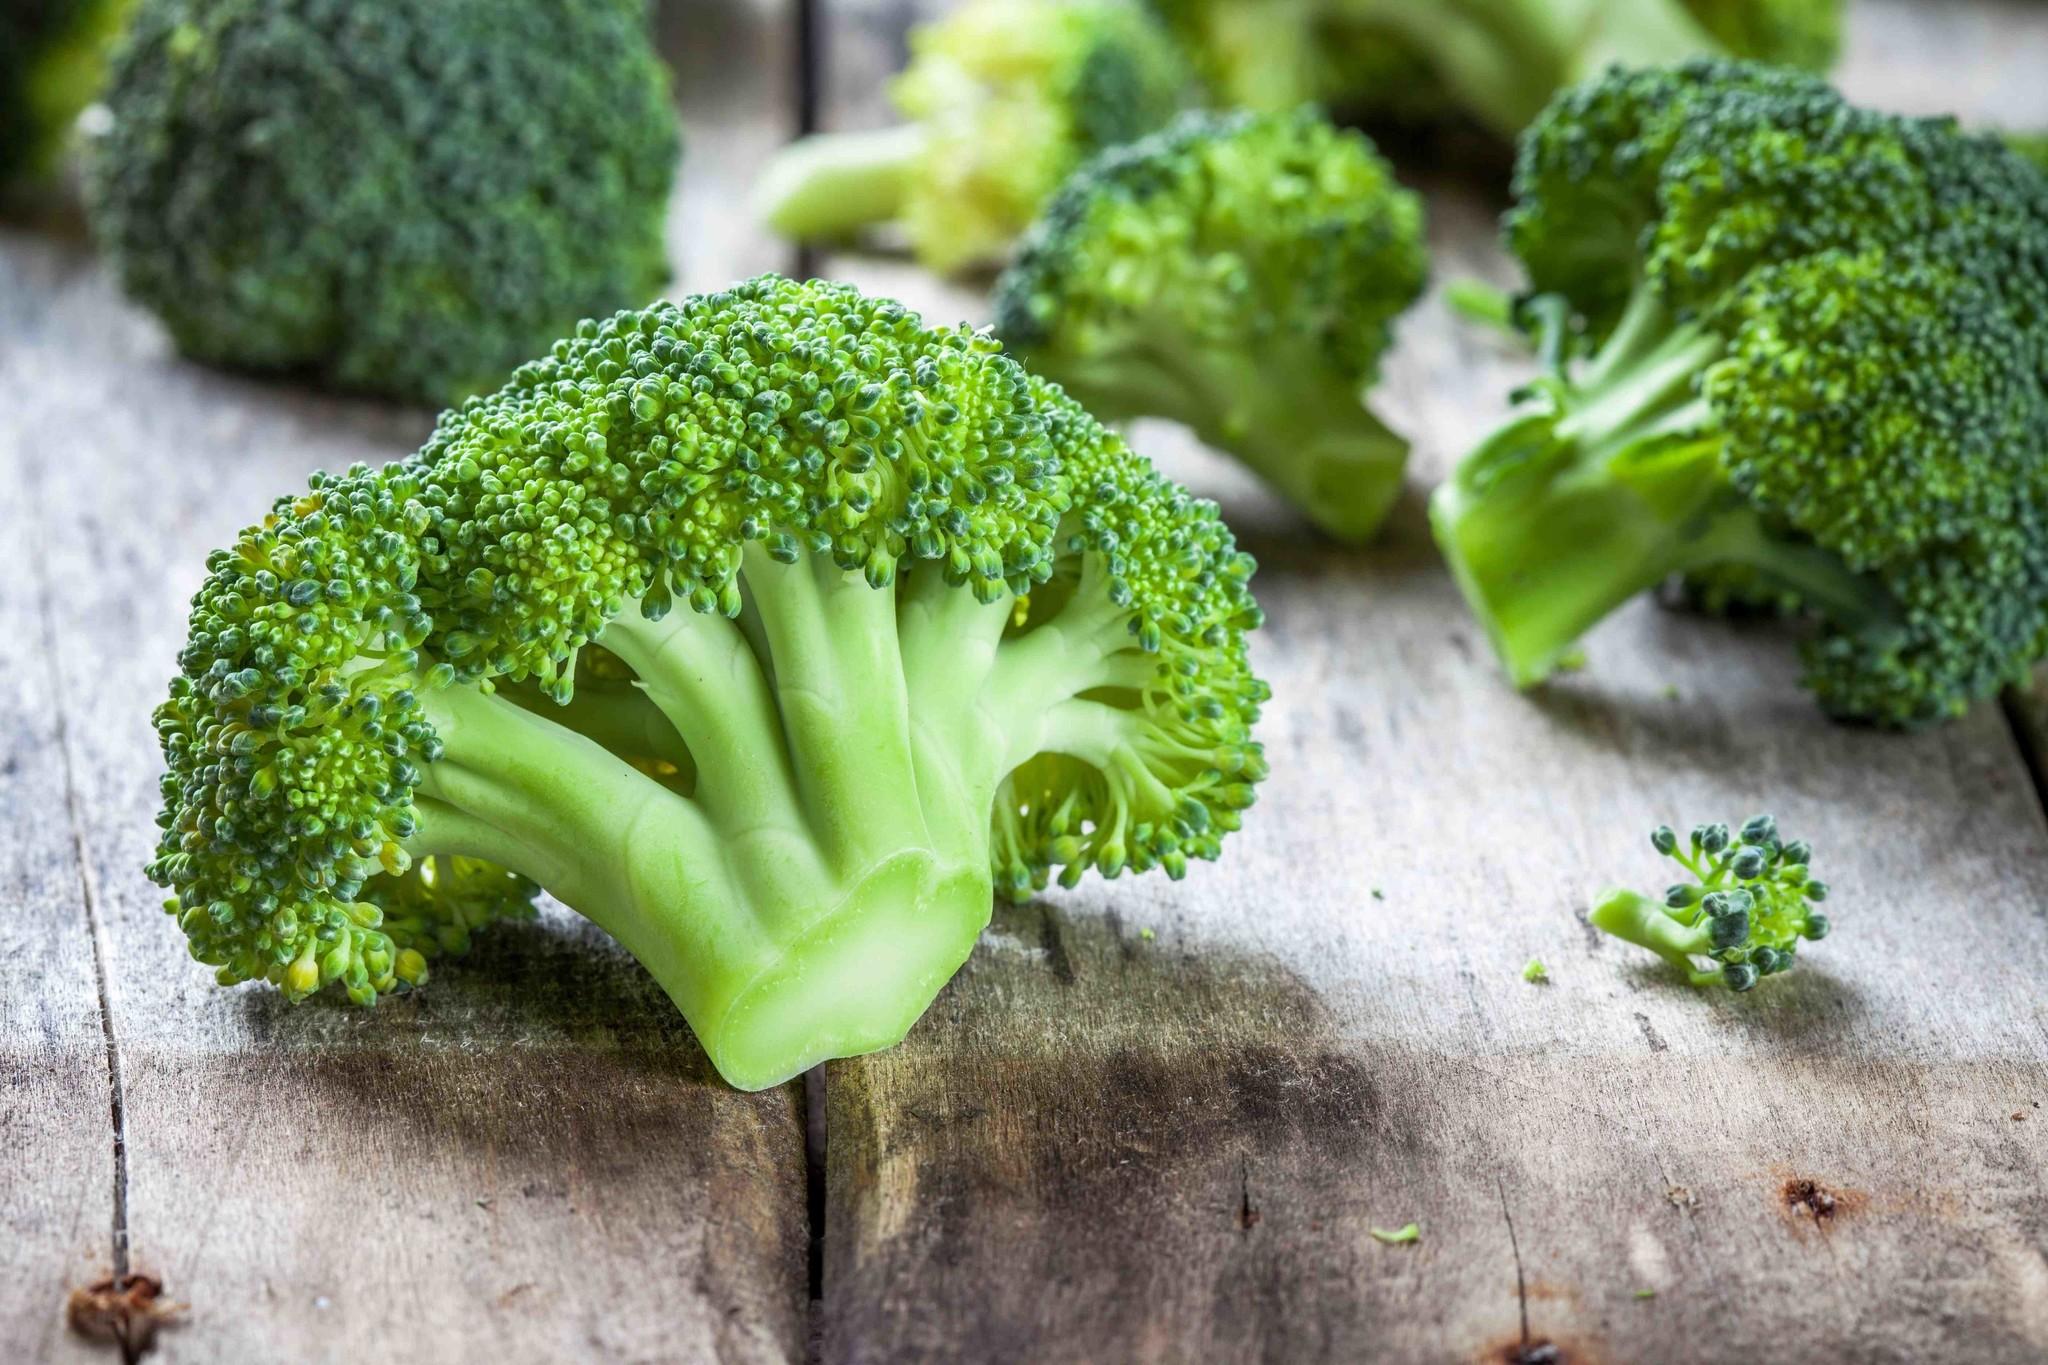 Slavink in jus met aardappelpuree en broccoli in tuinkruidensaus